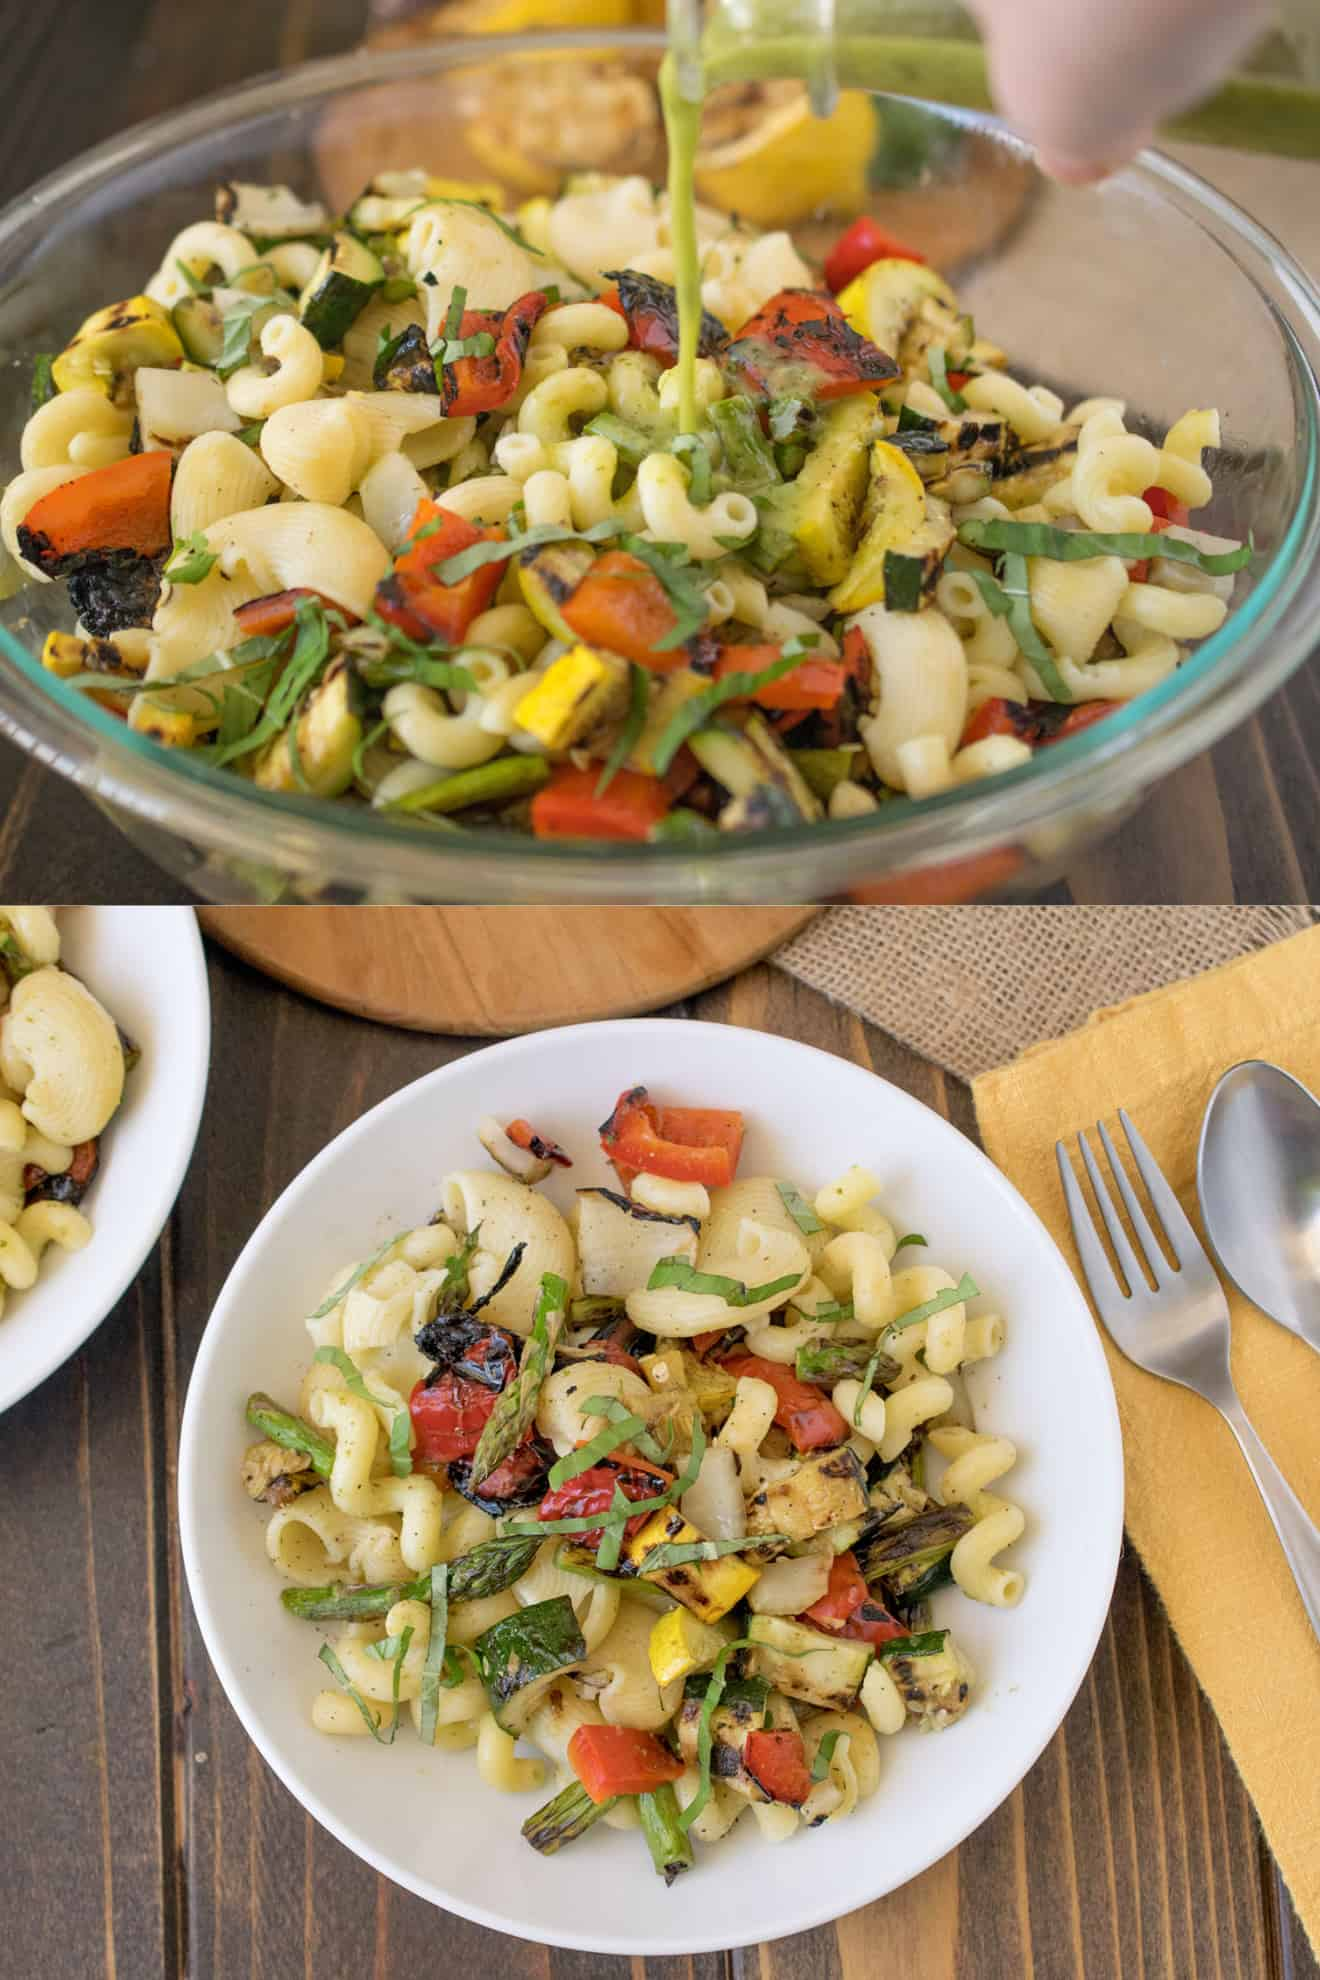 Pouring dressing over grilled spring vegetable pasta salad